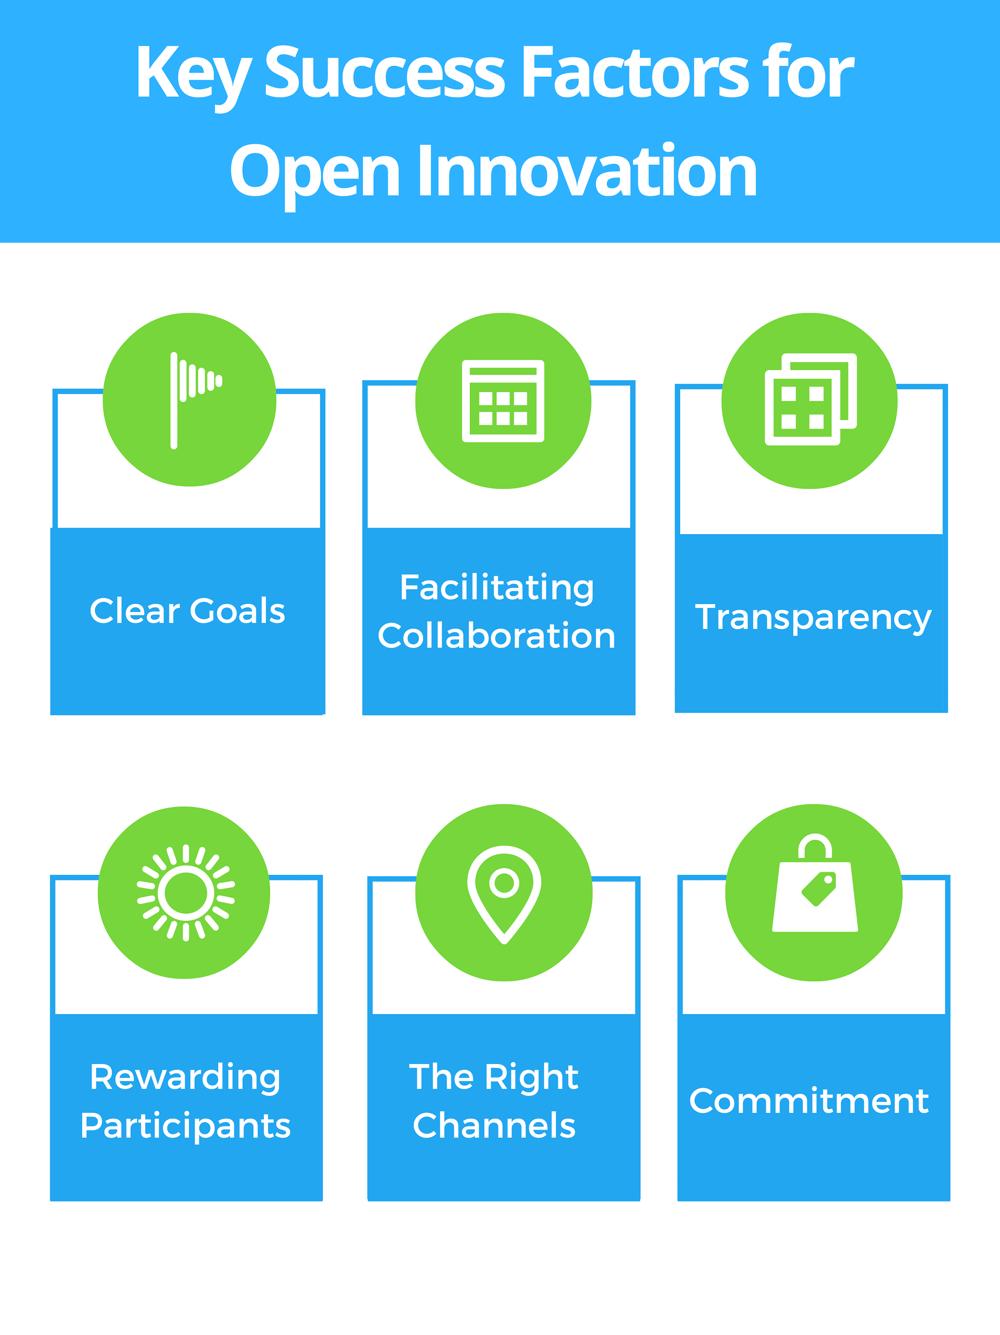 6 Key Success Factors for Open Innovation